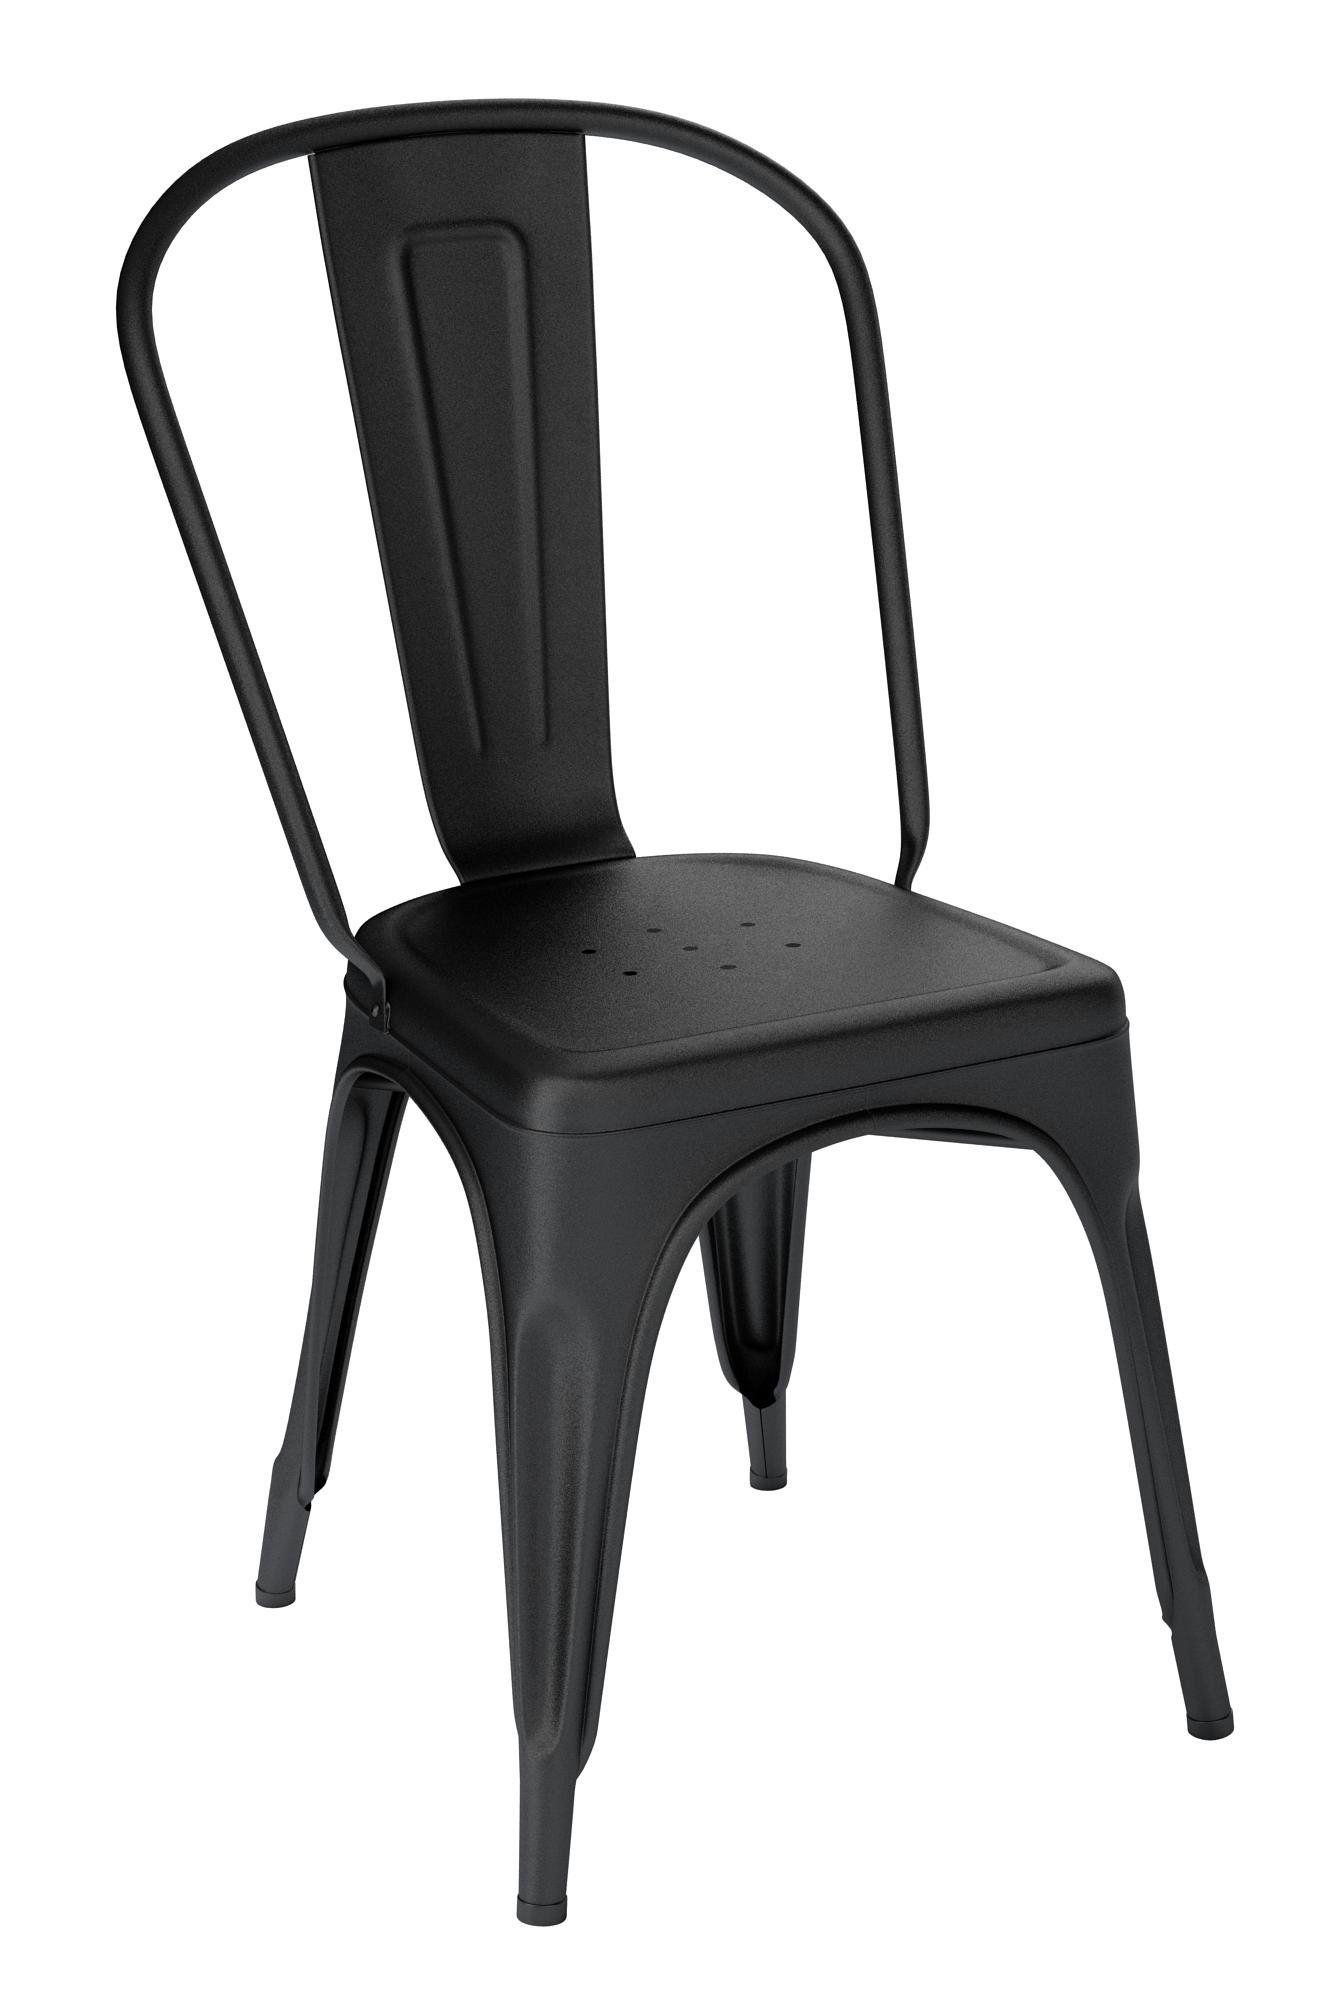 Tolix A Stuhl Indoor Schwarz Matt Indoor Edelstahlblech Stuhle Und Tolix Stuhl